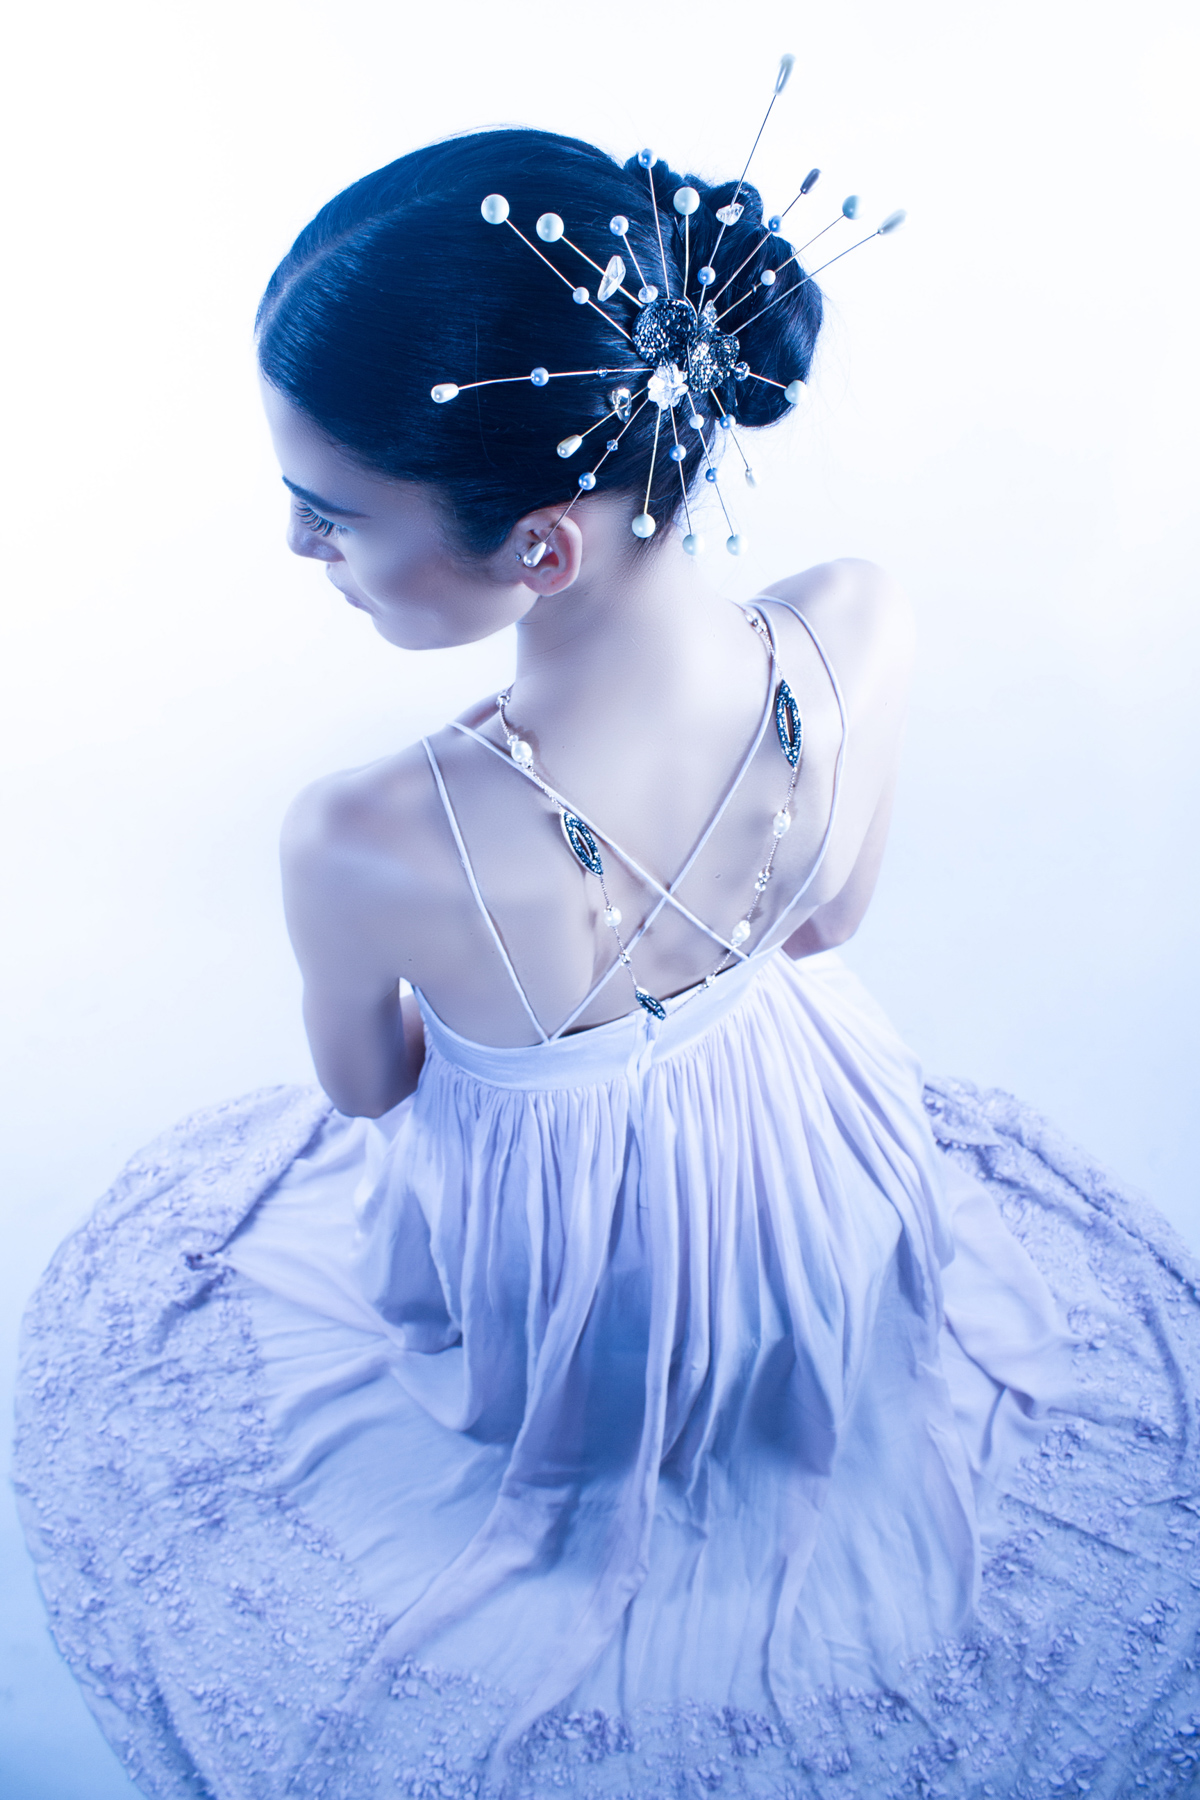 Vinita Michael - Pristine 2.jpg